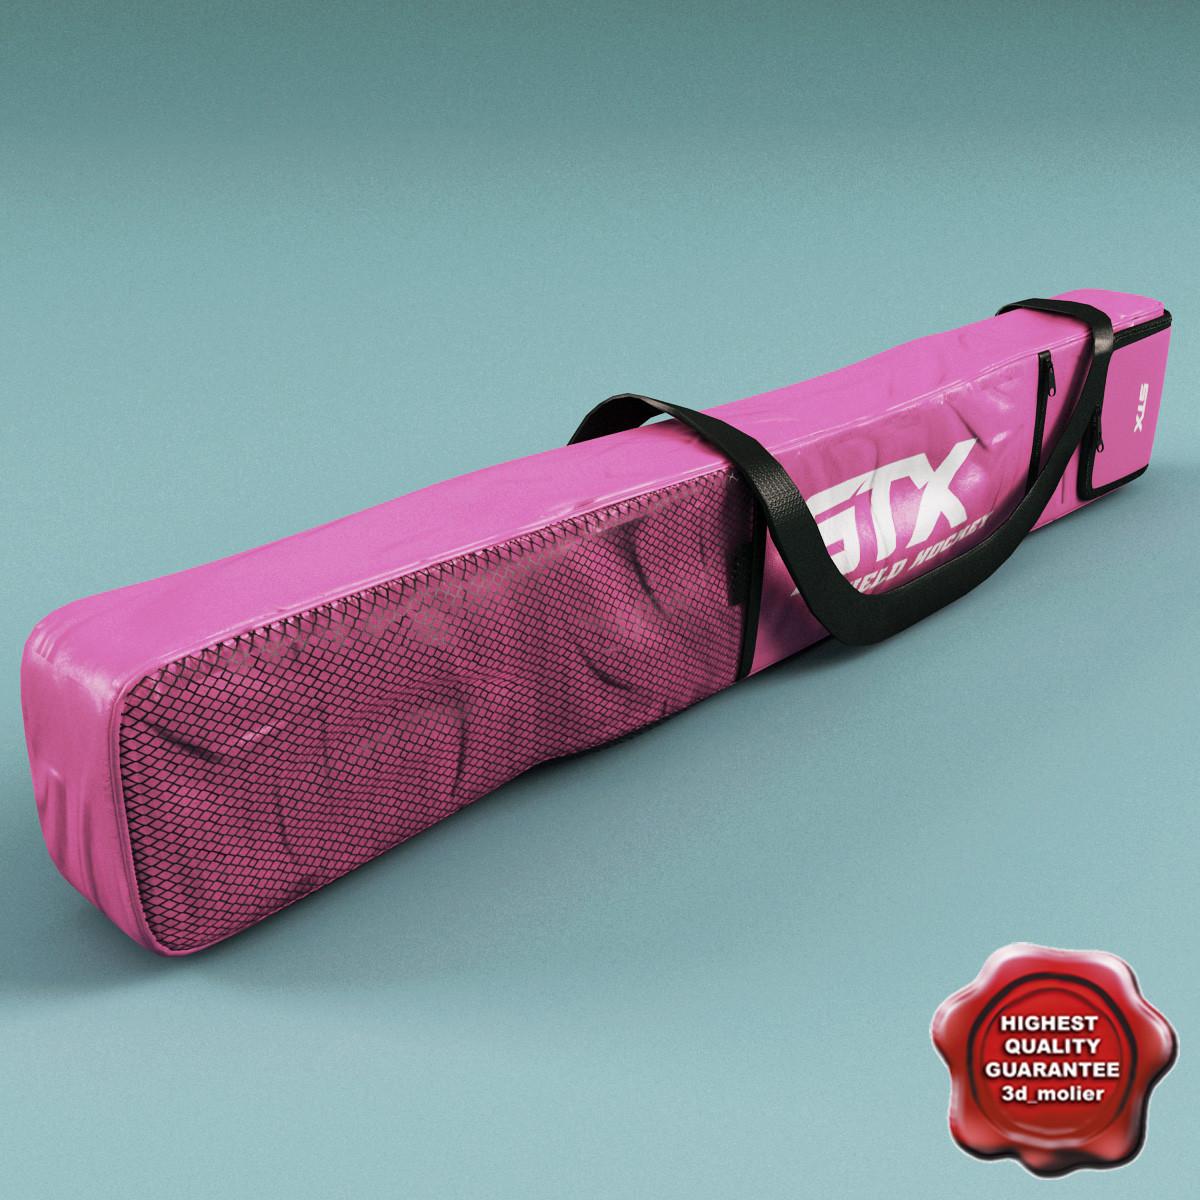 hockey stick bag stx11 3d lwo